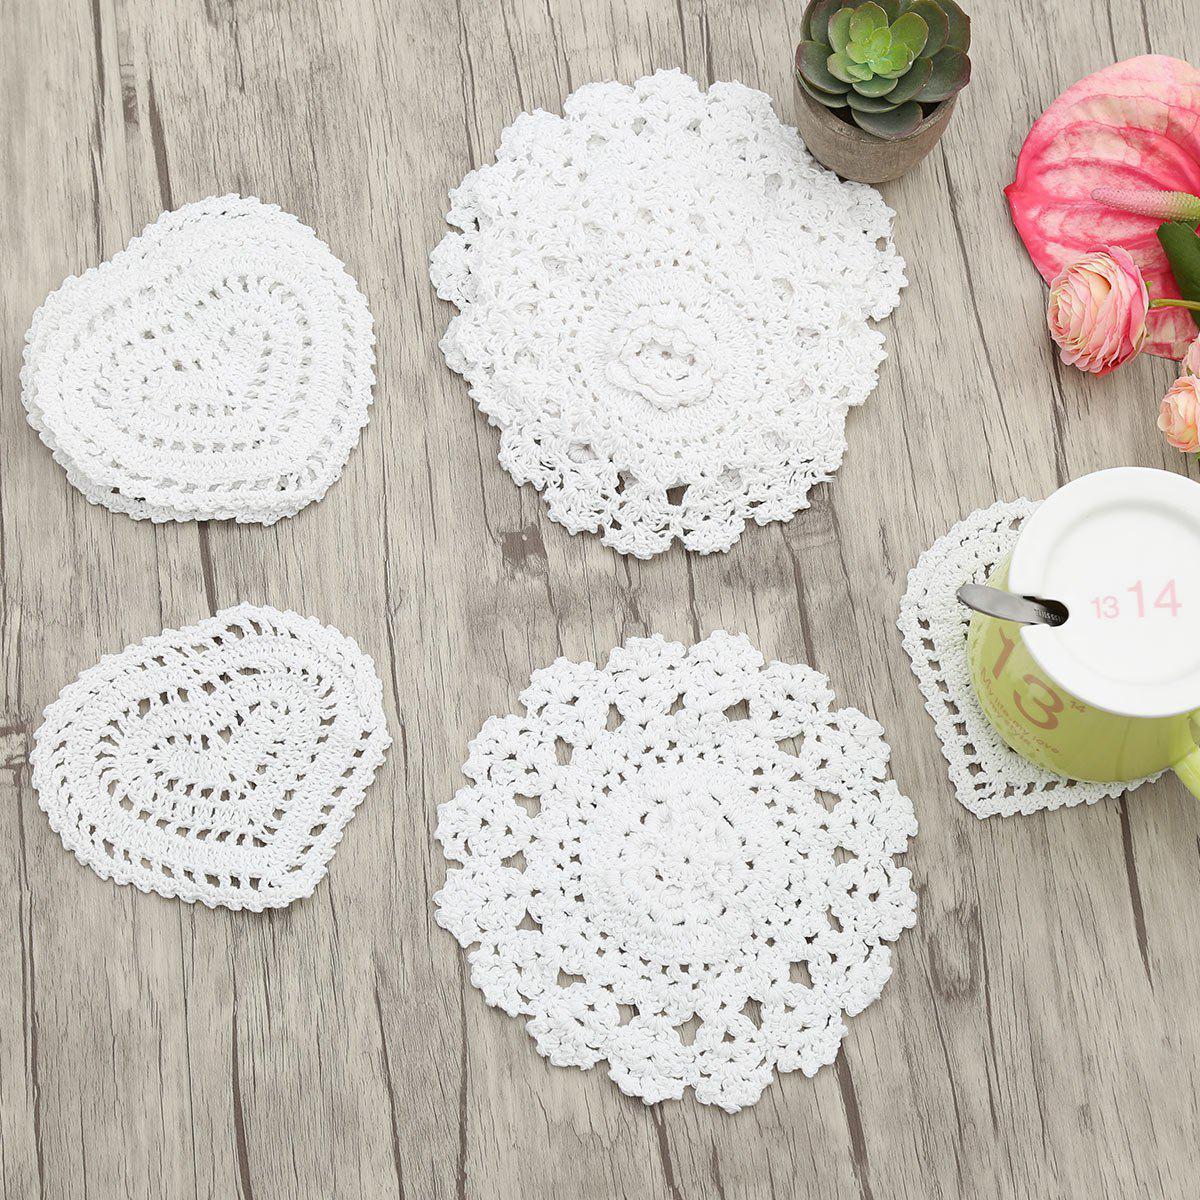 10pcs Handmade Round Heart Shape Crochet Lace Doilies 217974501